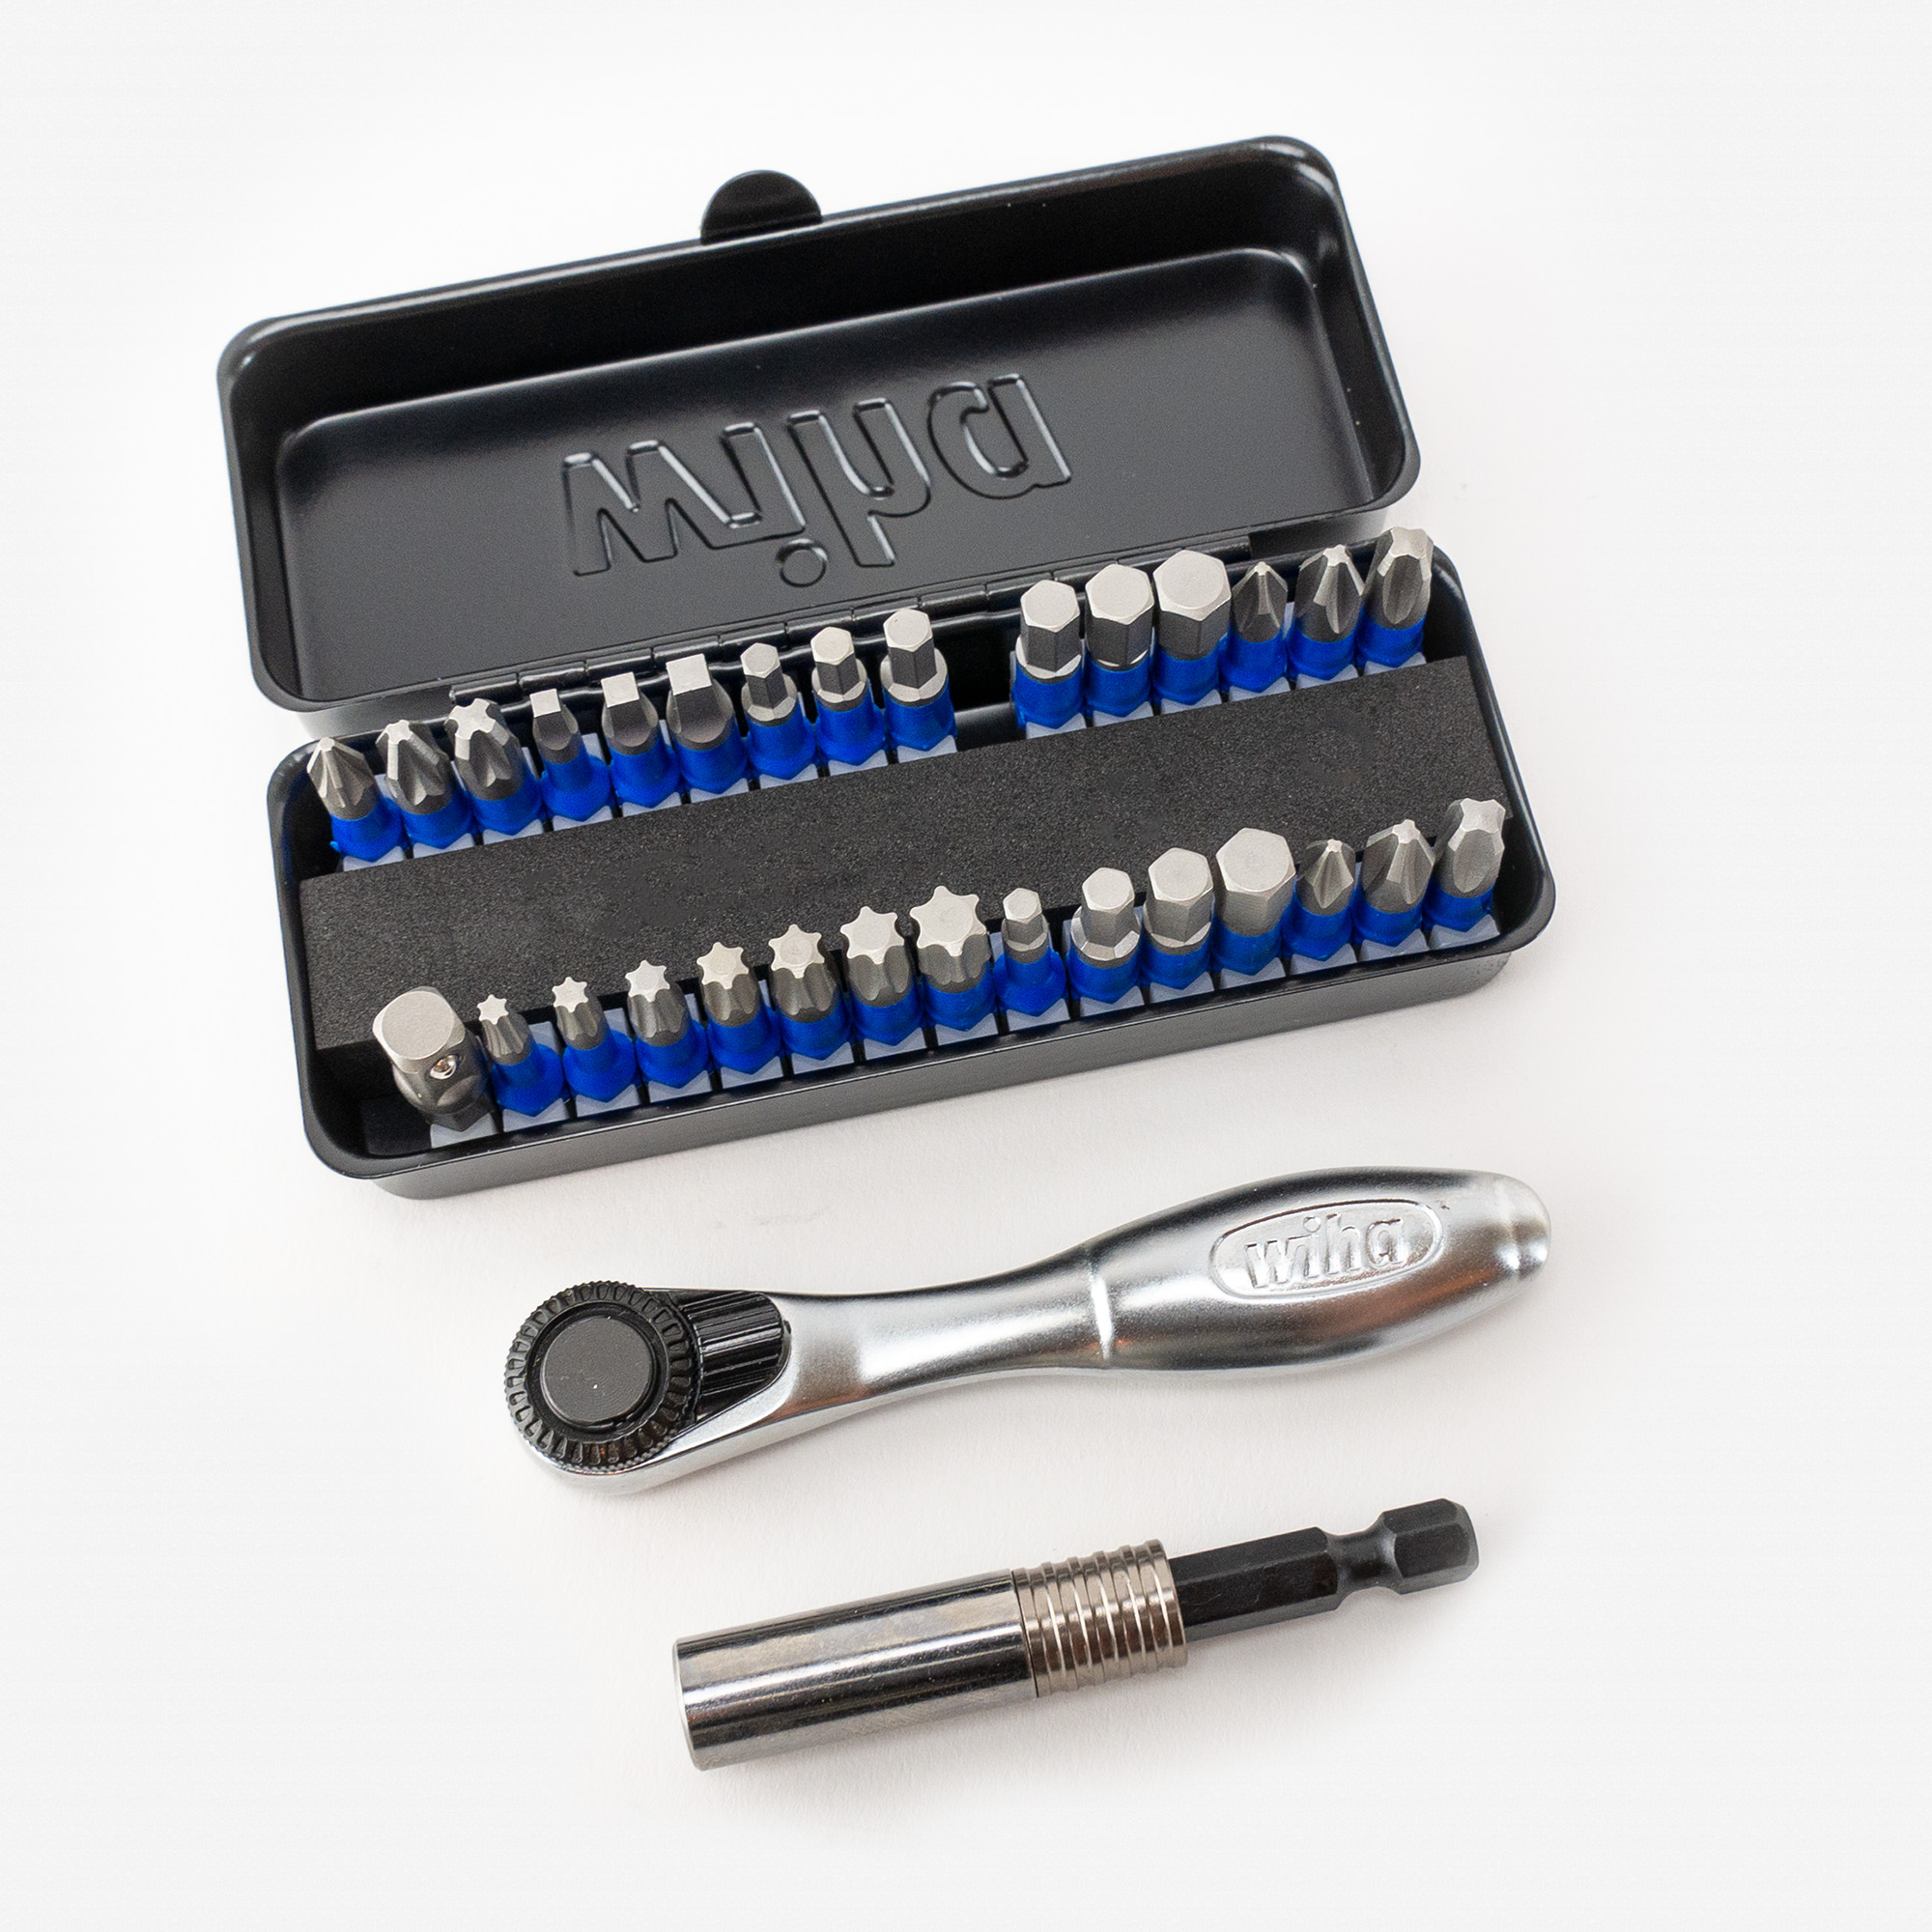 Wiha 76889 Impact Bit Set with Ratchet and Compact Storage Box, 32 Pieces - KC Tool